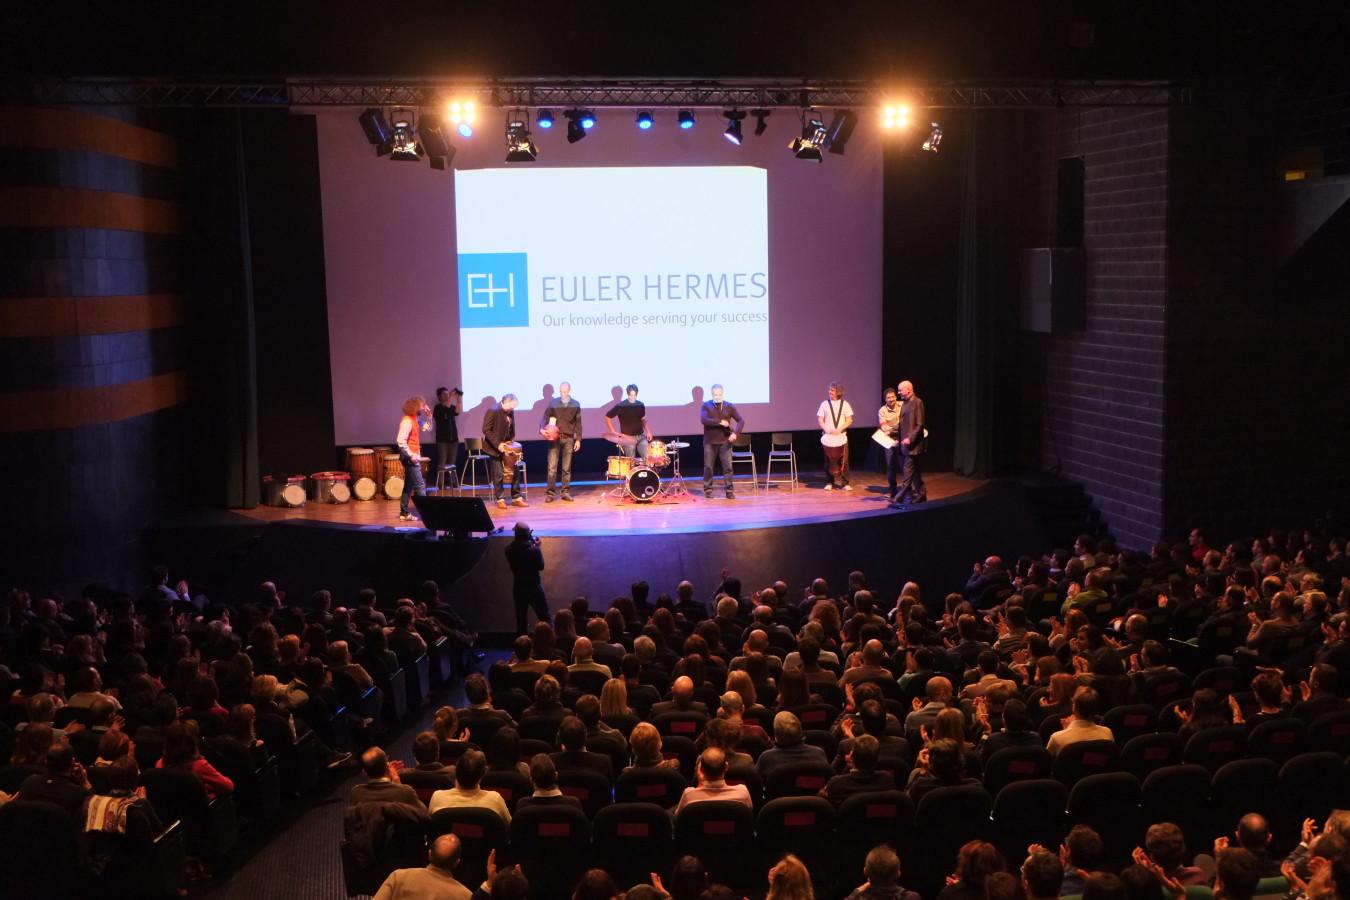 Eventi Speciali   Euler Hermes